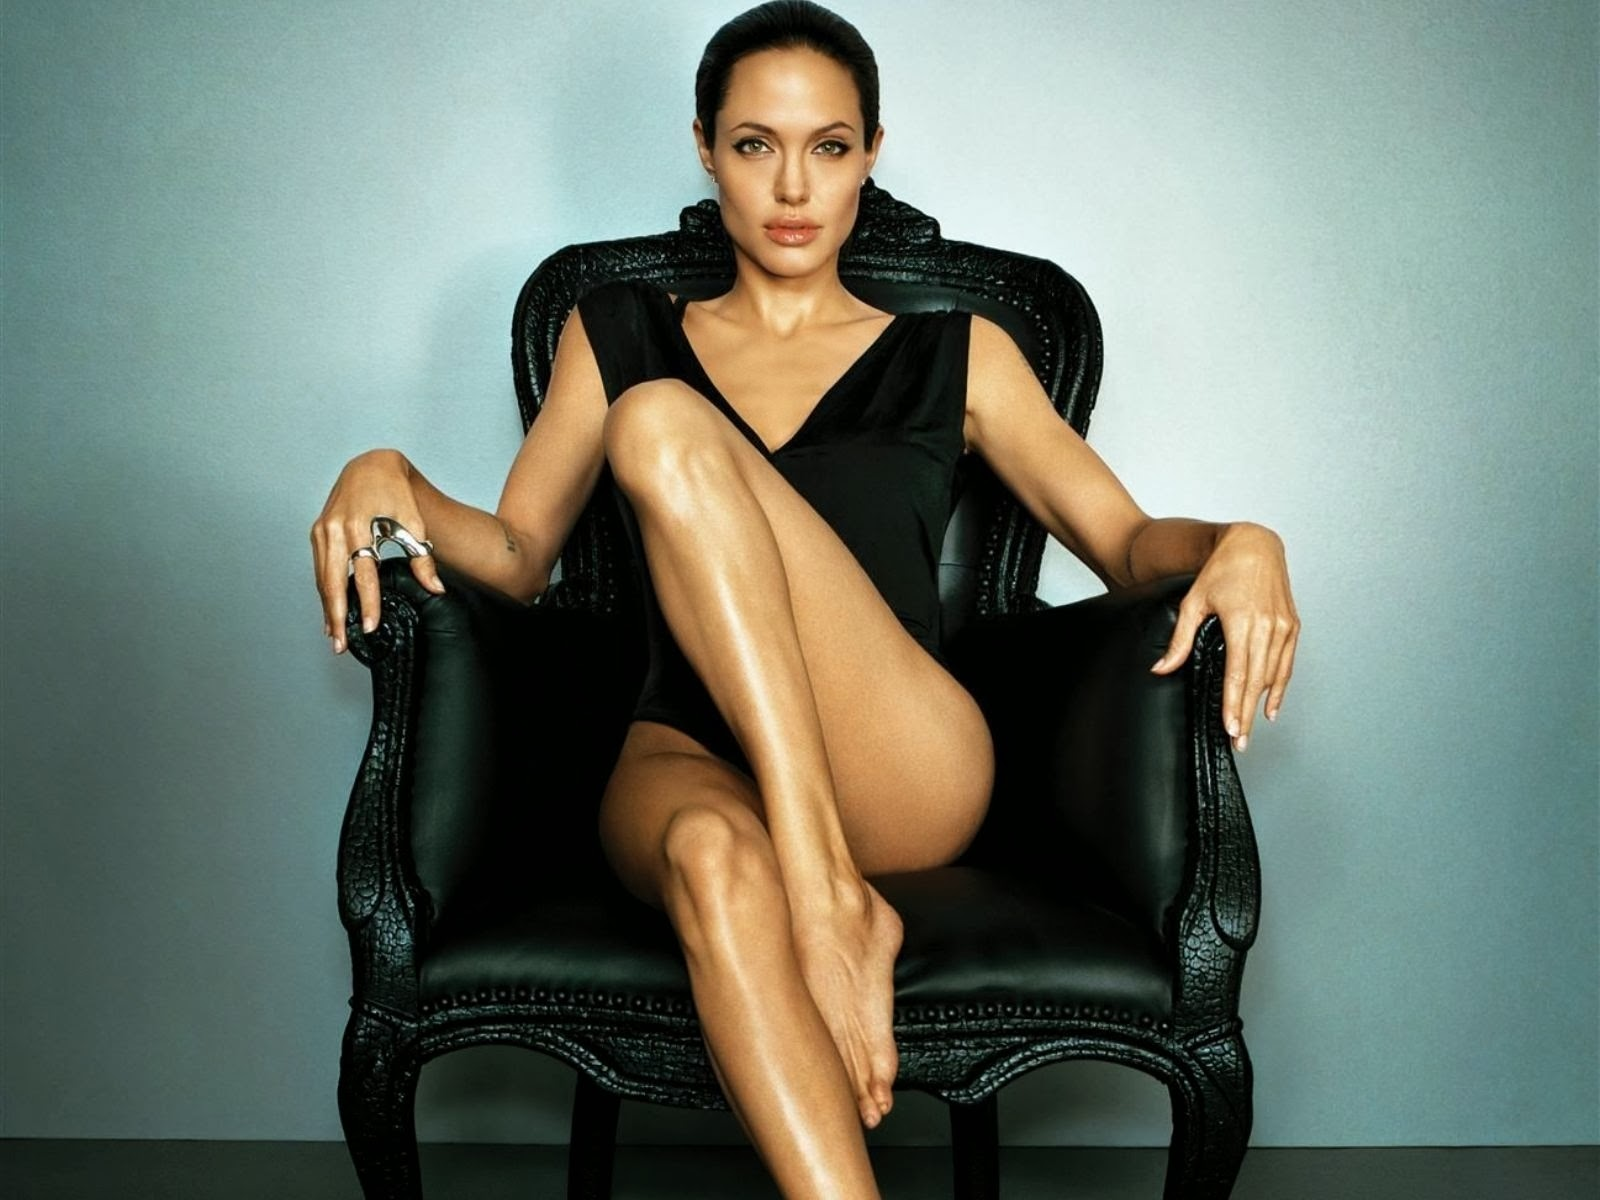 Bons Rapazes Angelina Jolie 40 anos 2